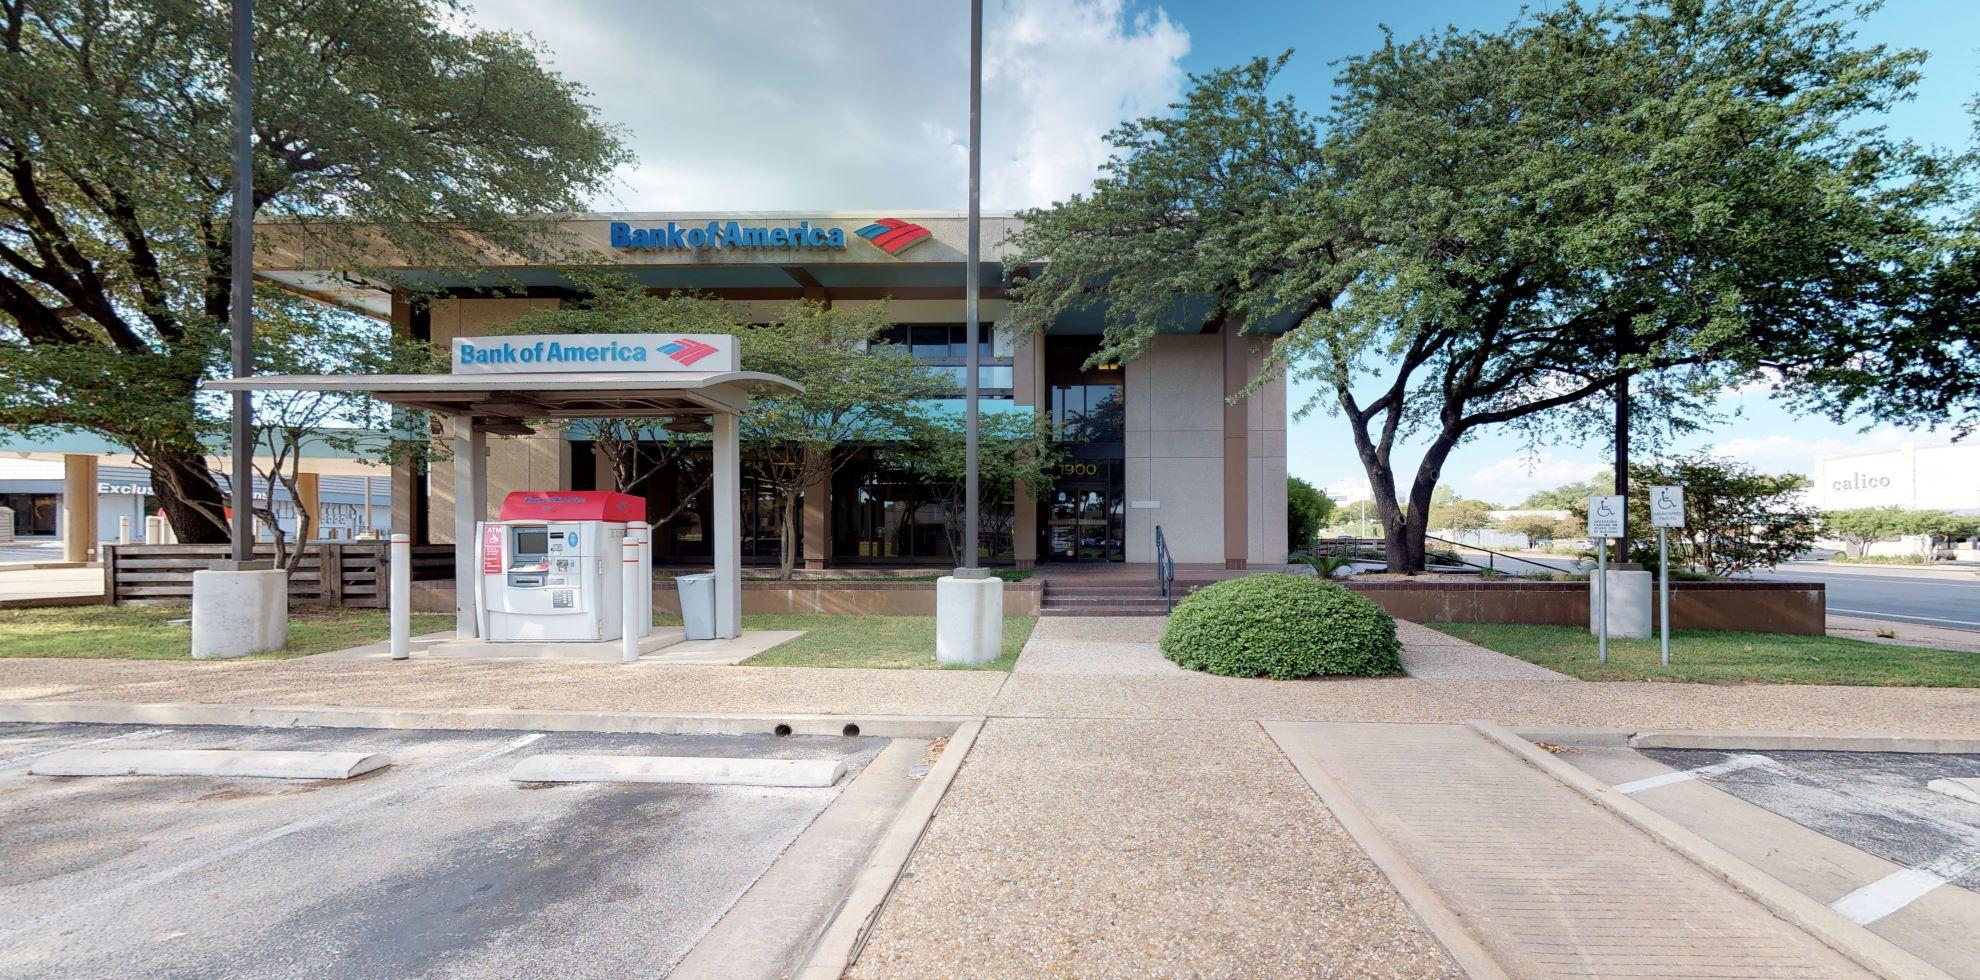 Bank of America financial center with drive-thru ATM | 7900 Shoal Creek Blvd, Austin, TX 78757